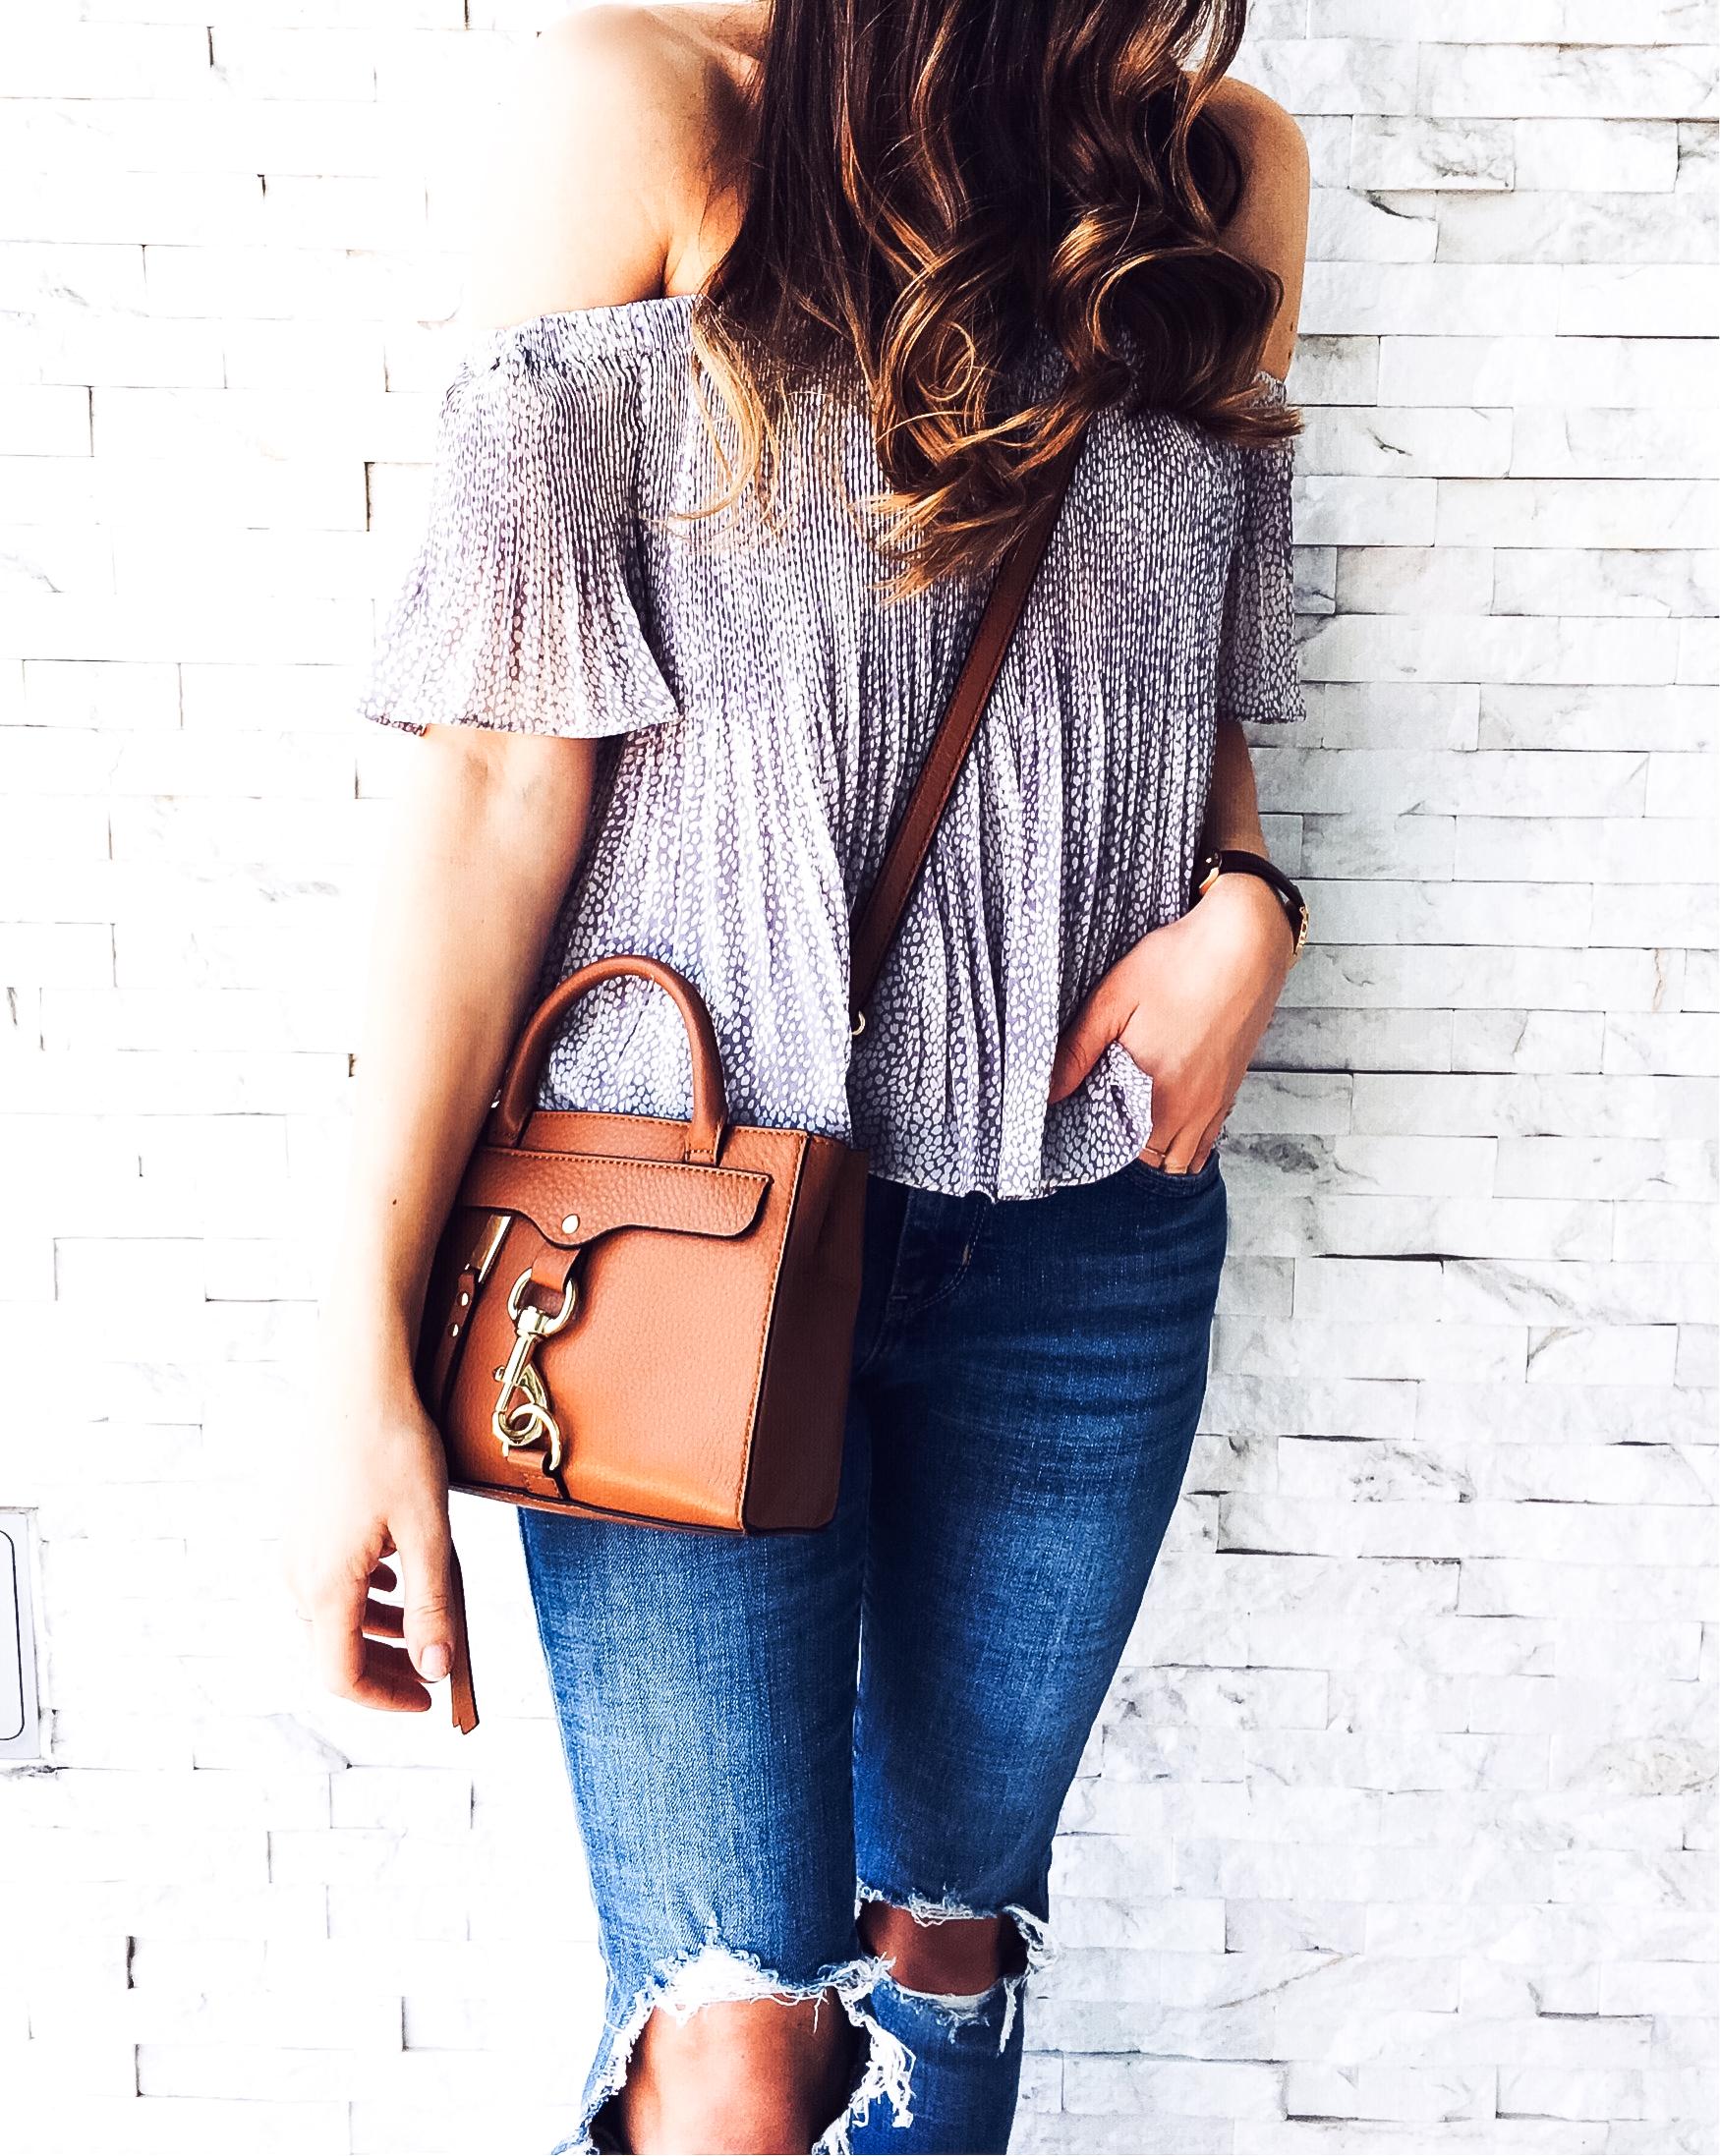 Shop the Look Below.  Nordstrom Top  |  Levi's Jeans  |  Vince Slides  |  Rebecca Minkoff Bag  |  Gorjana Rings  c/o